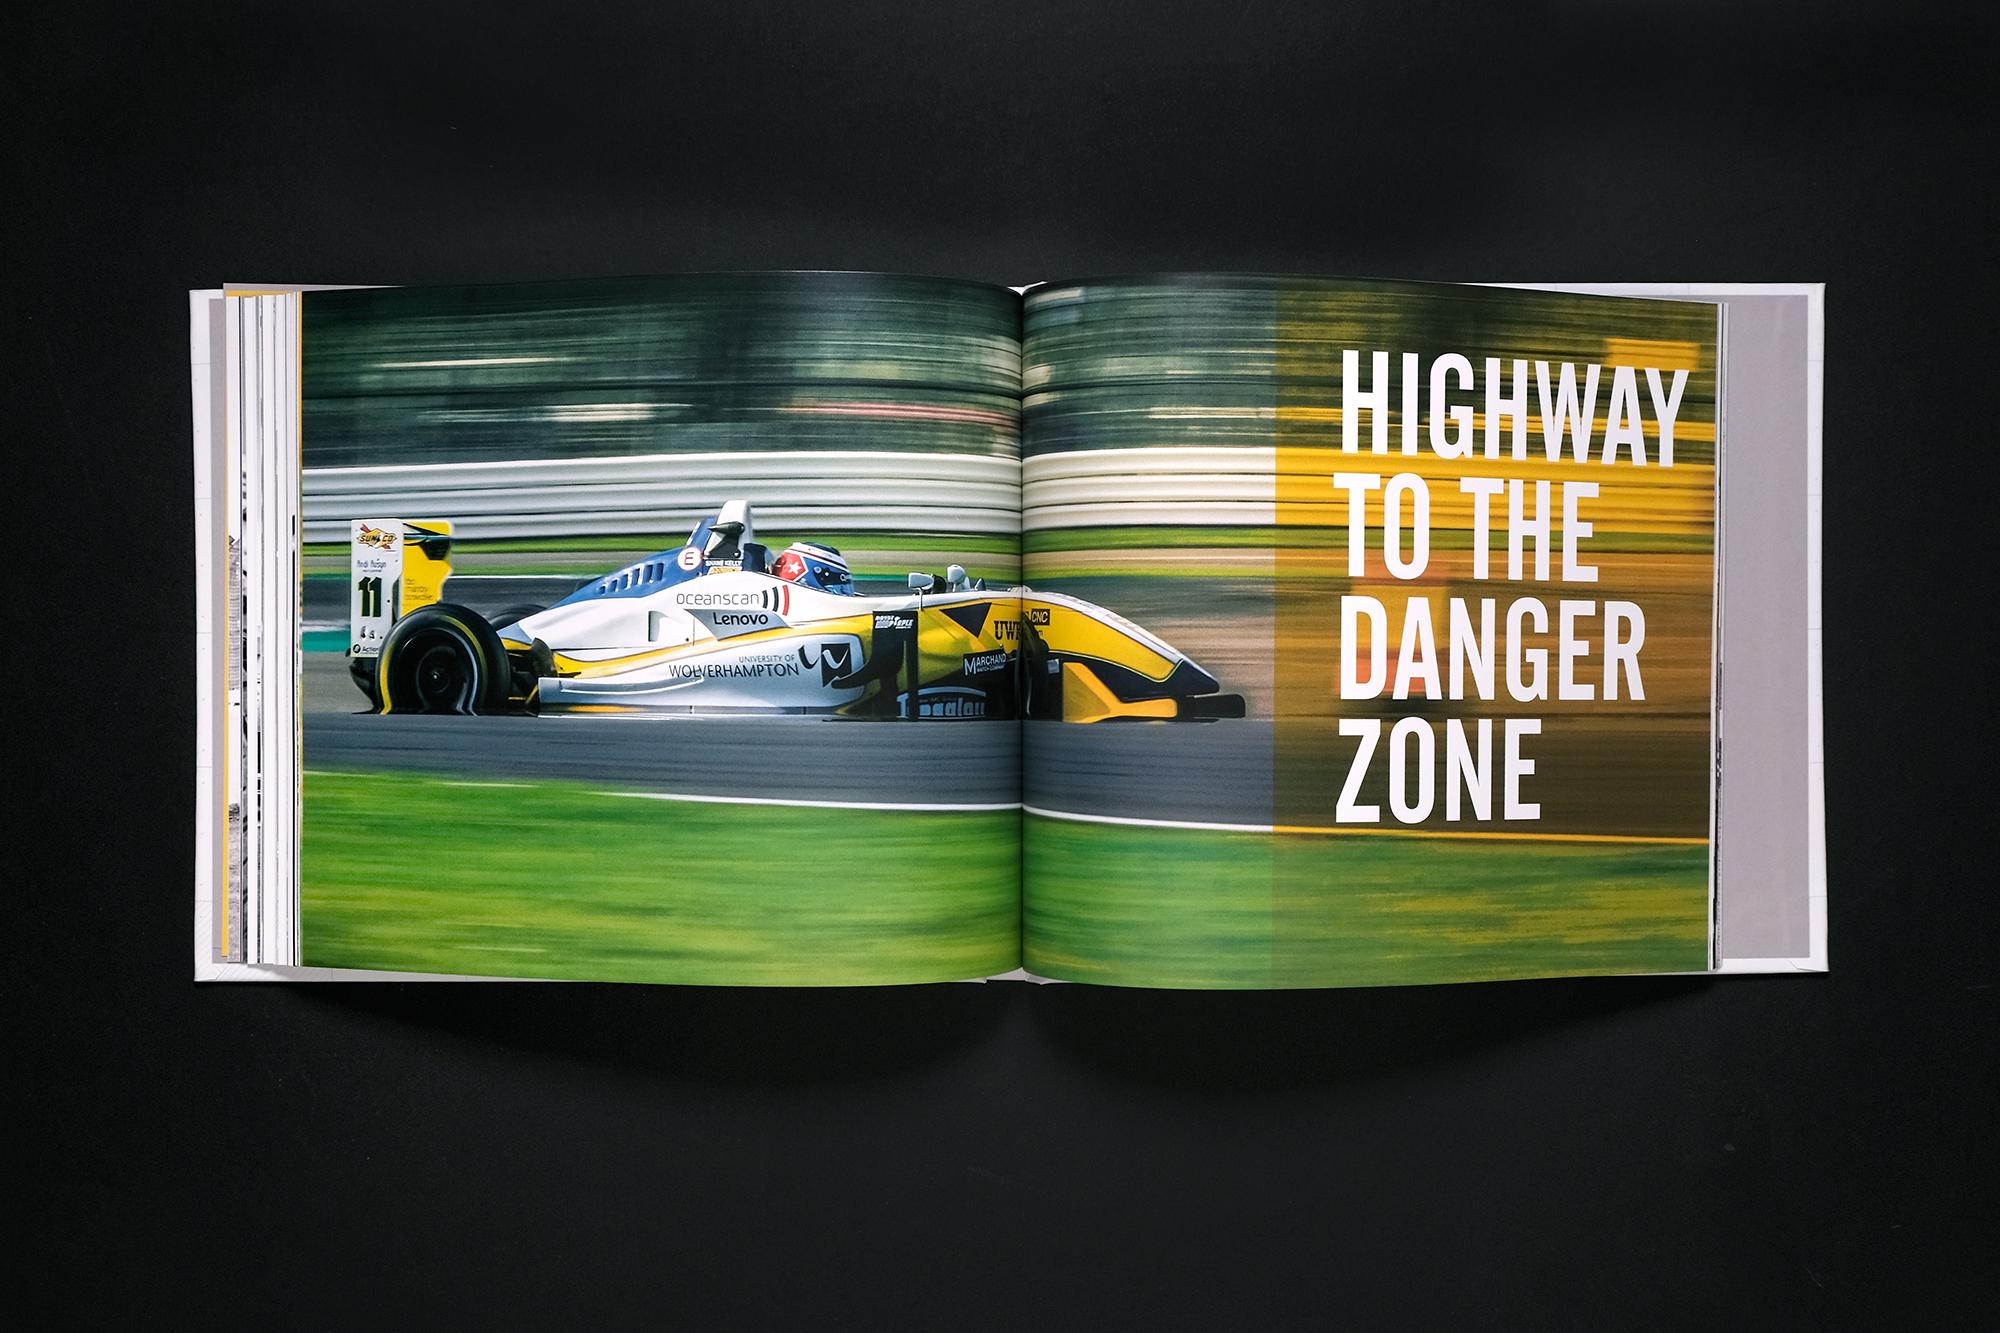 https://rusyndesign.co.uk/wp-content/uploads/2020/04/UWR-19-book-shots-19.jpg